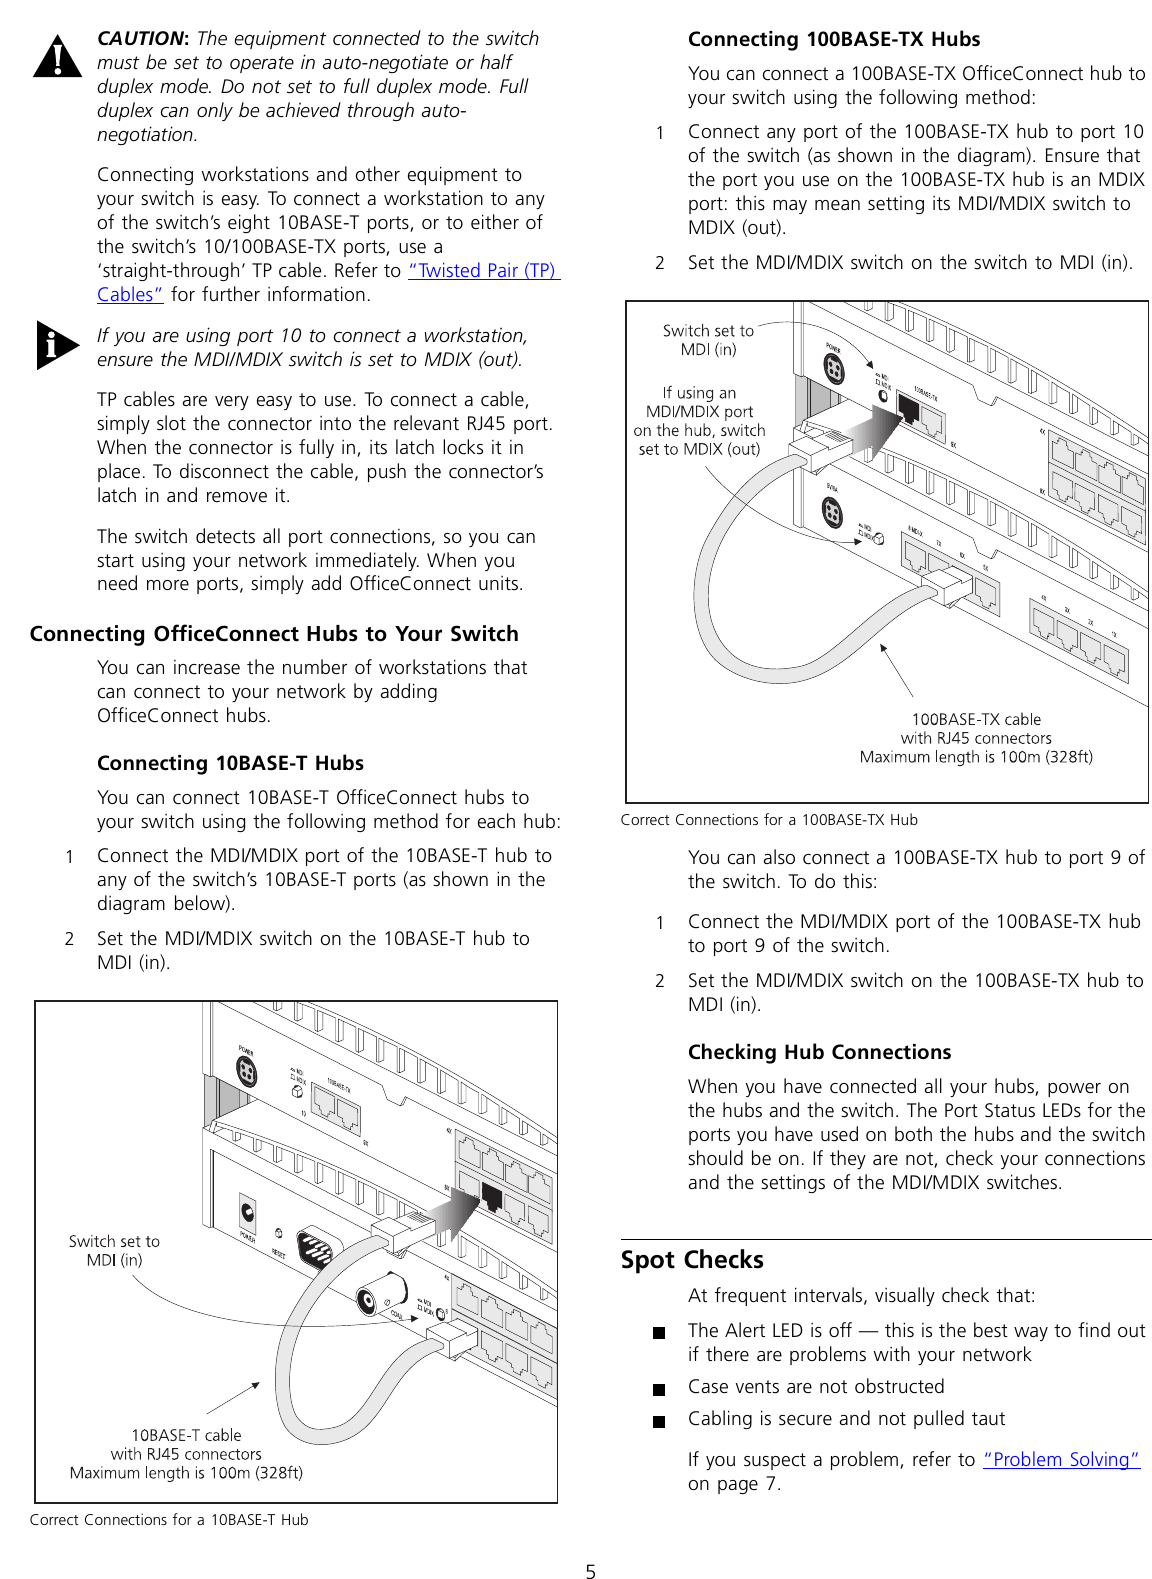 3COM 3C16732 DRIVERS MAC